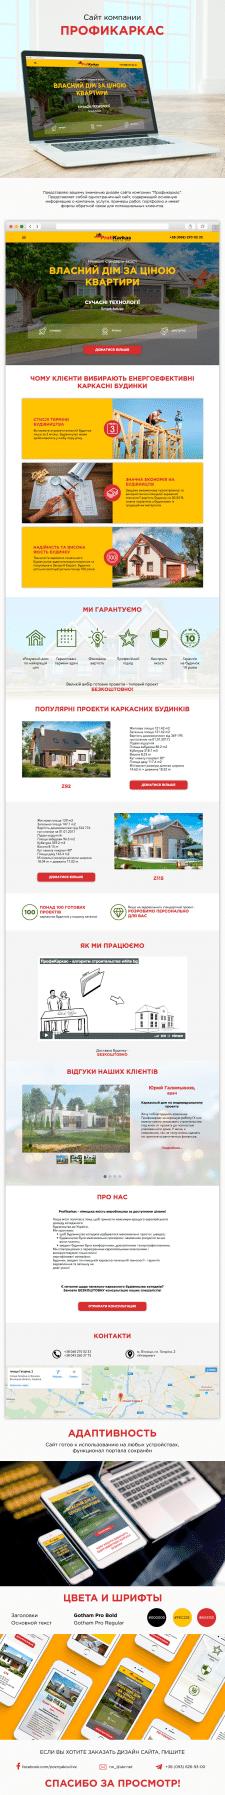 Дизайн сайта компании Профикаркас